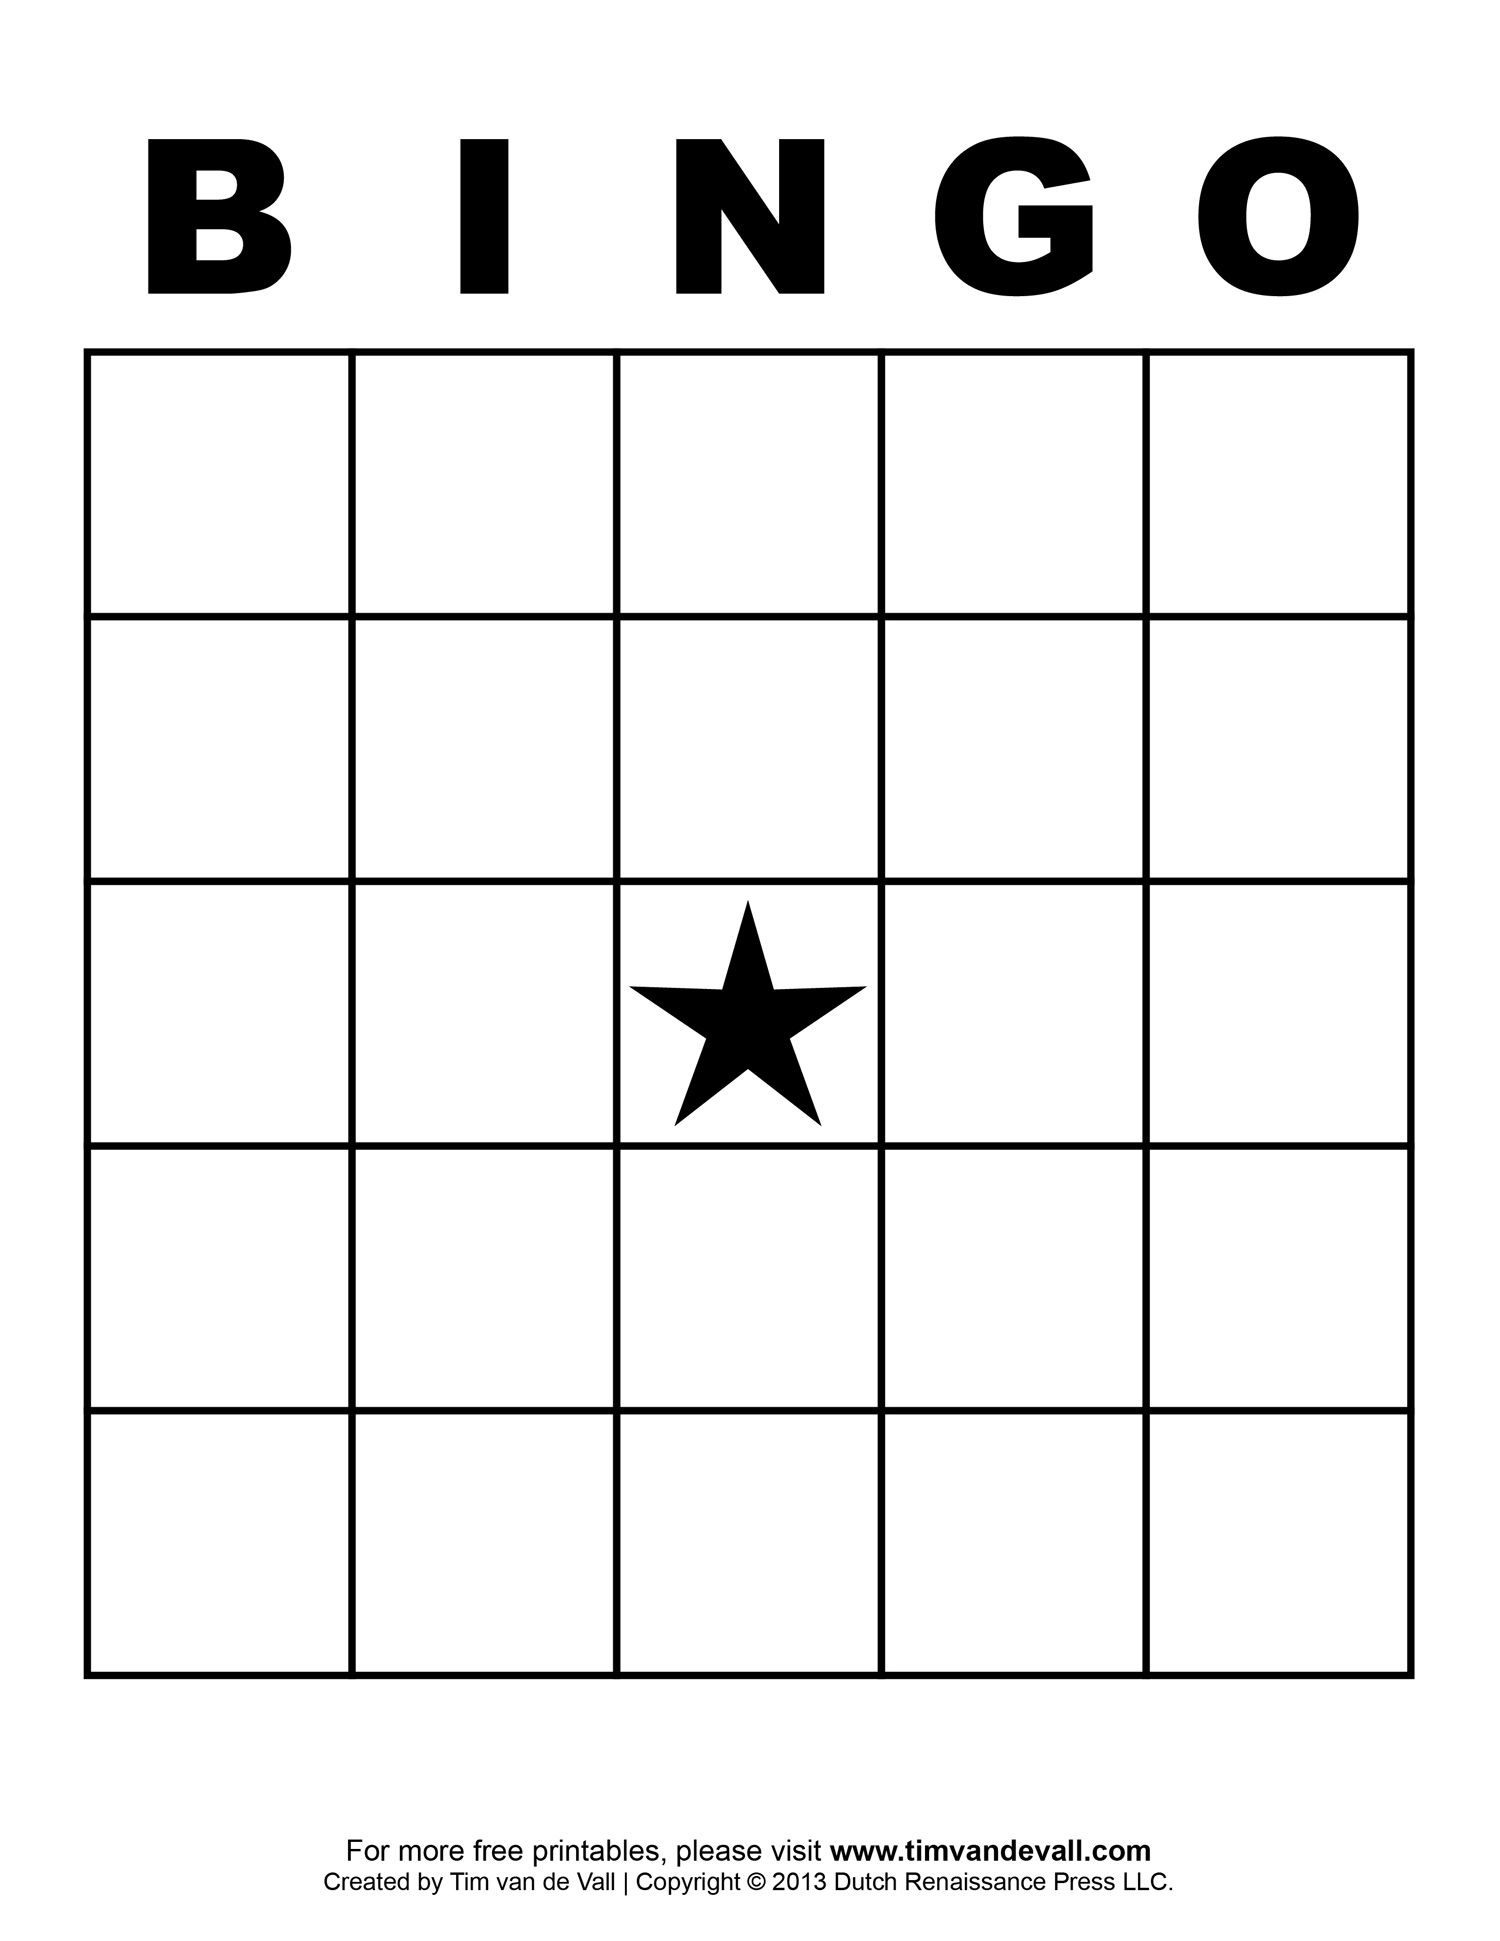 Free Printable Blank Bingo Cards Template 4 X 4 | Classroom | Blank - Free Printable Blank Bingo Cards